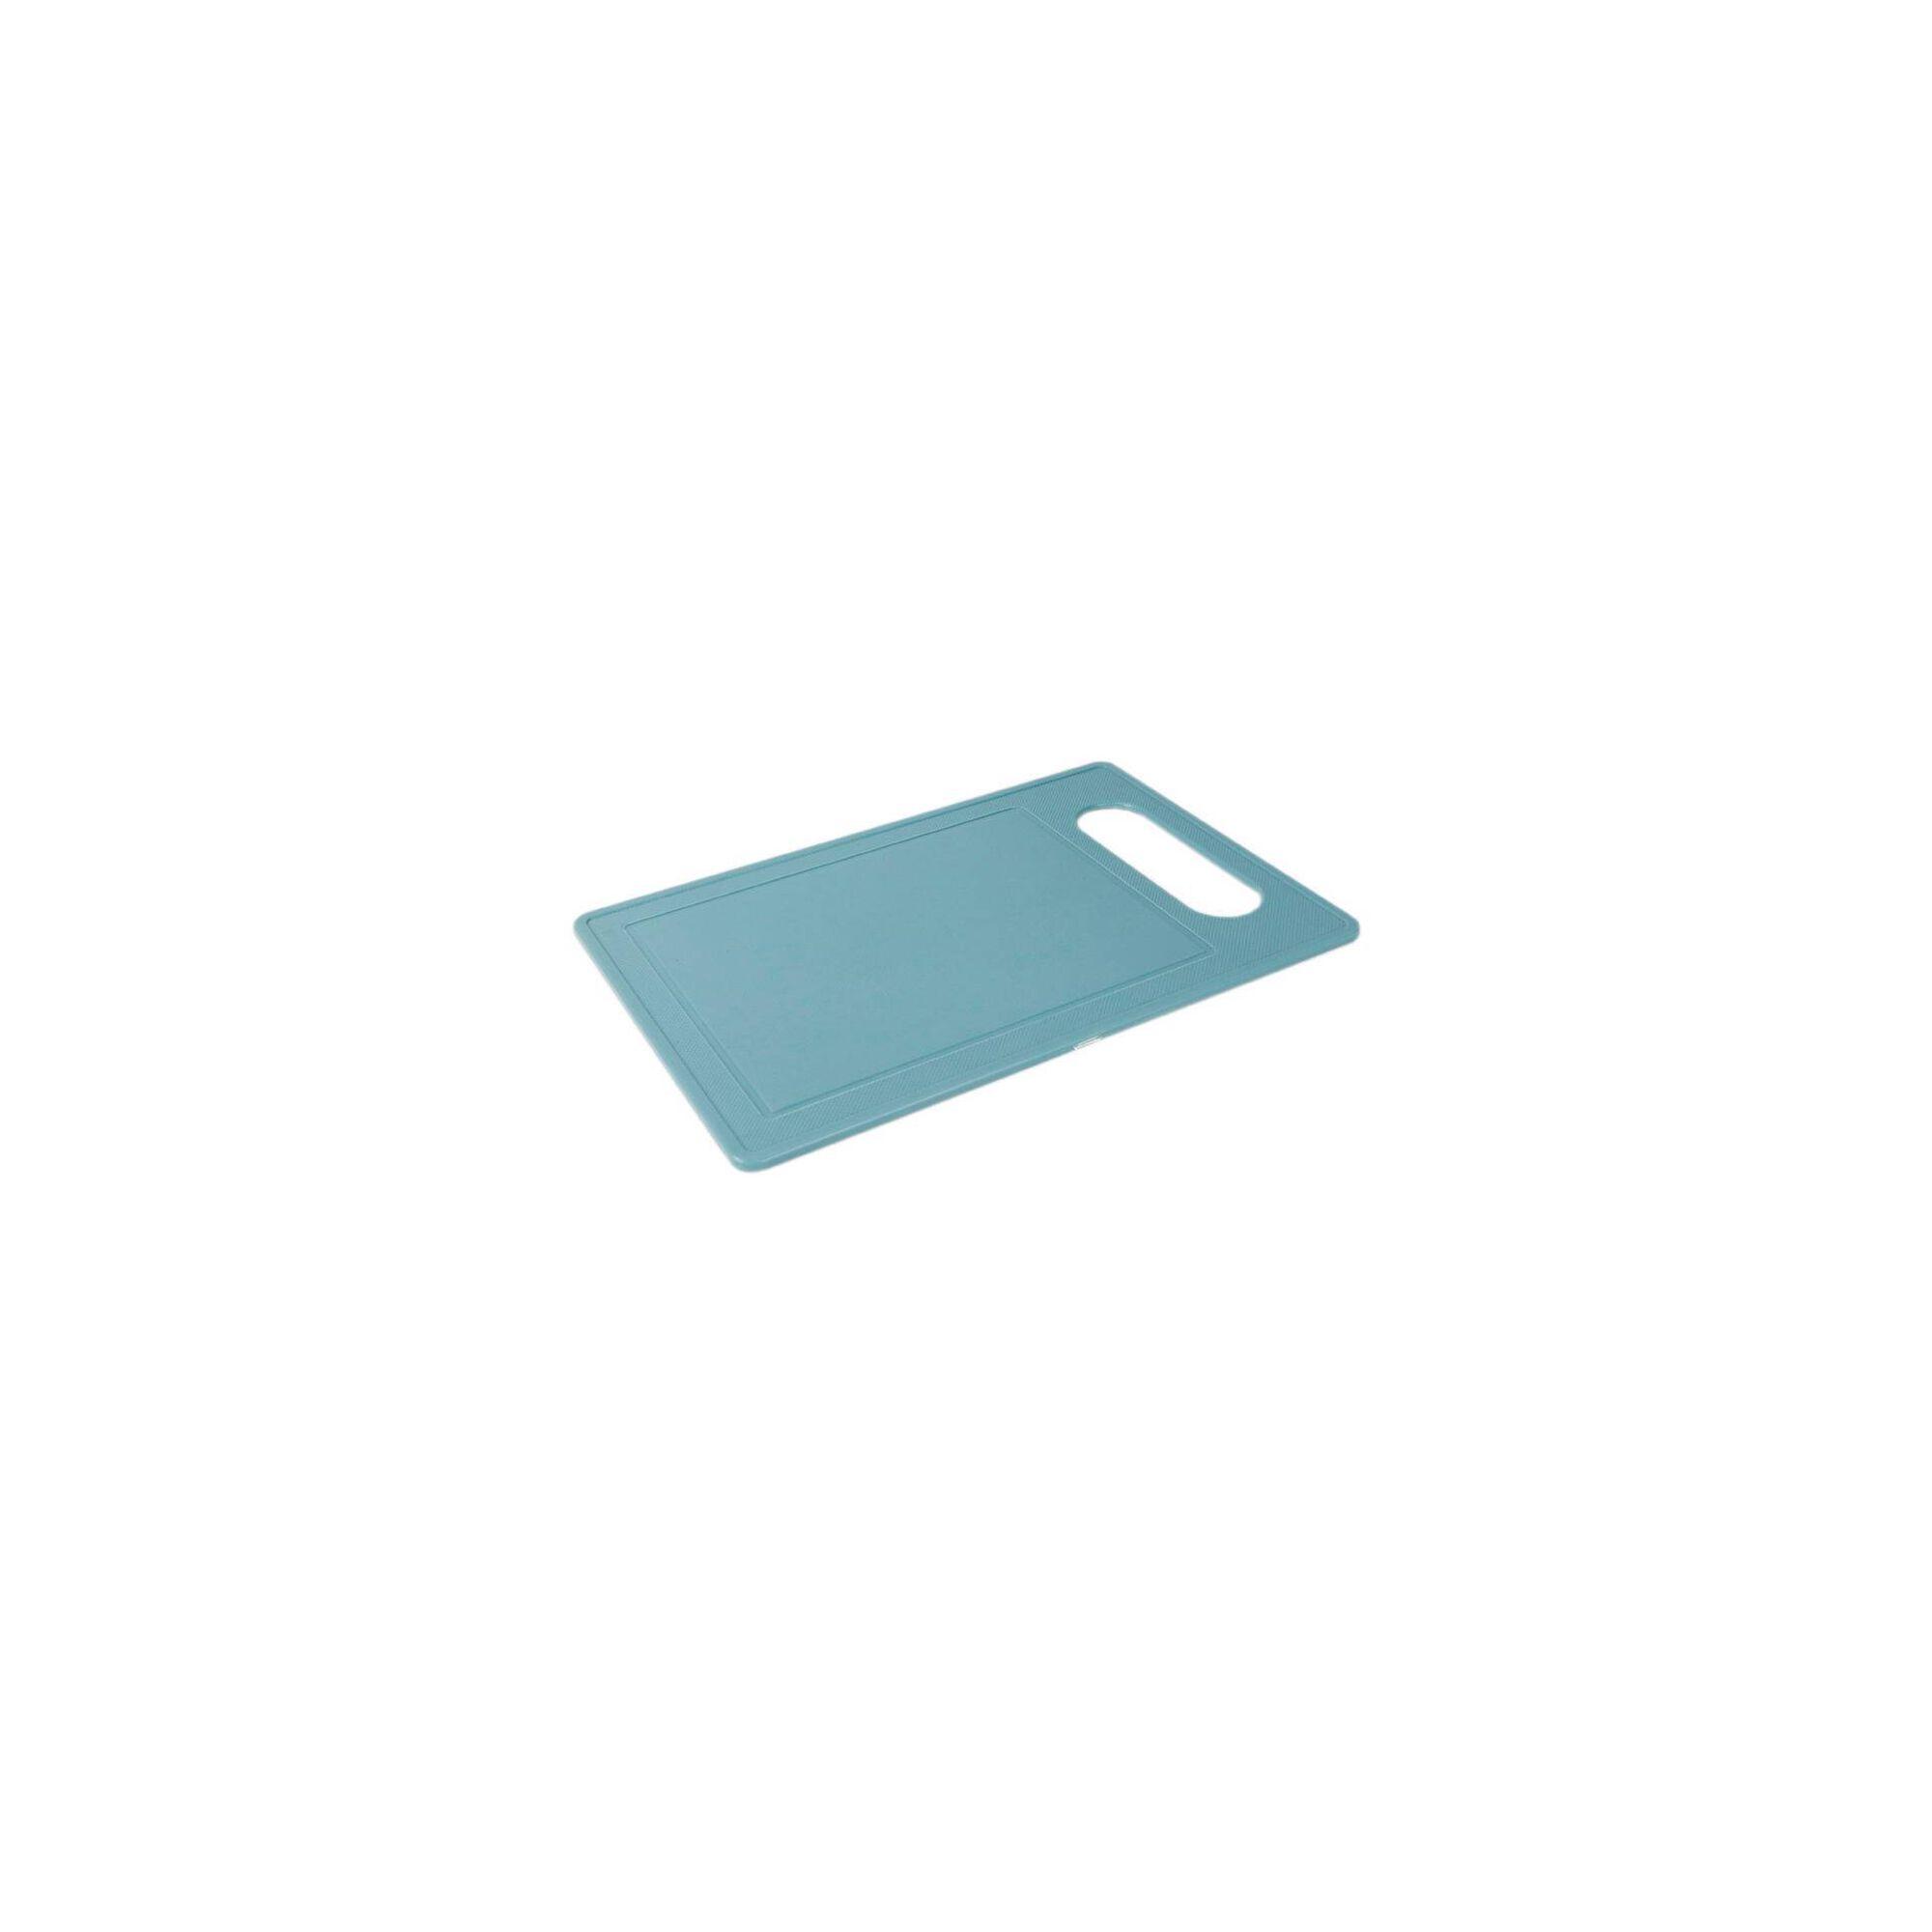 Tábua Plástico 23x15cm Essencial